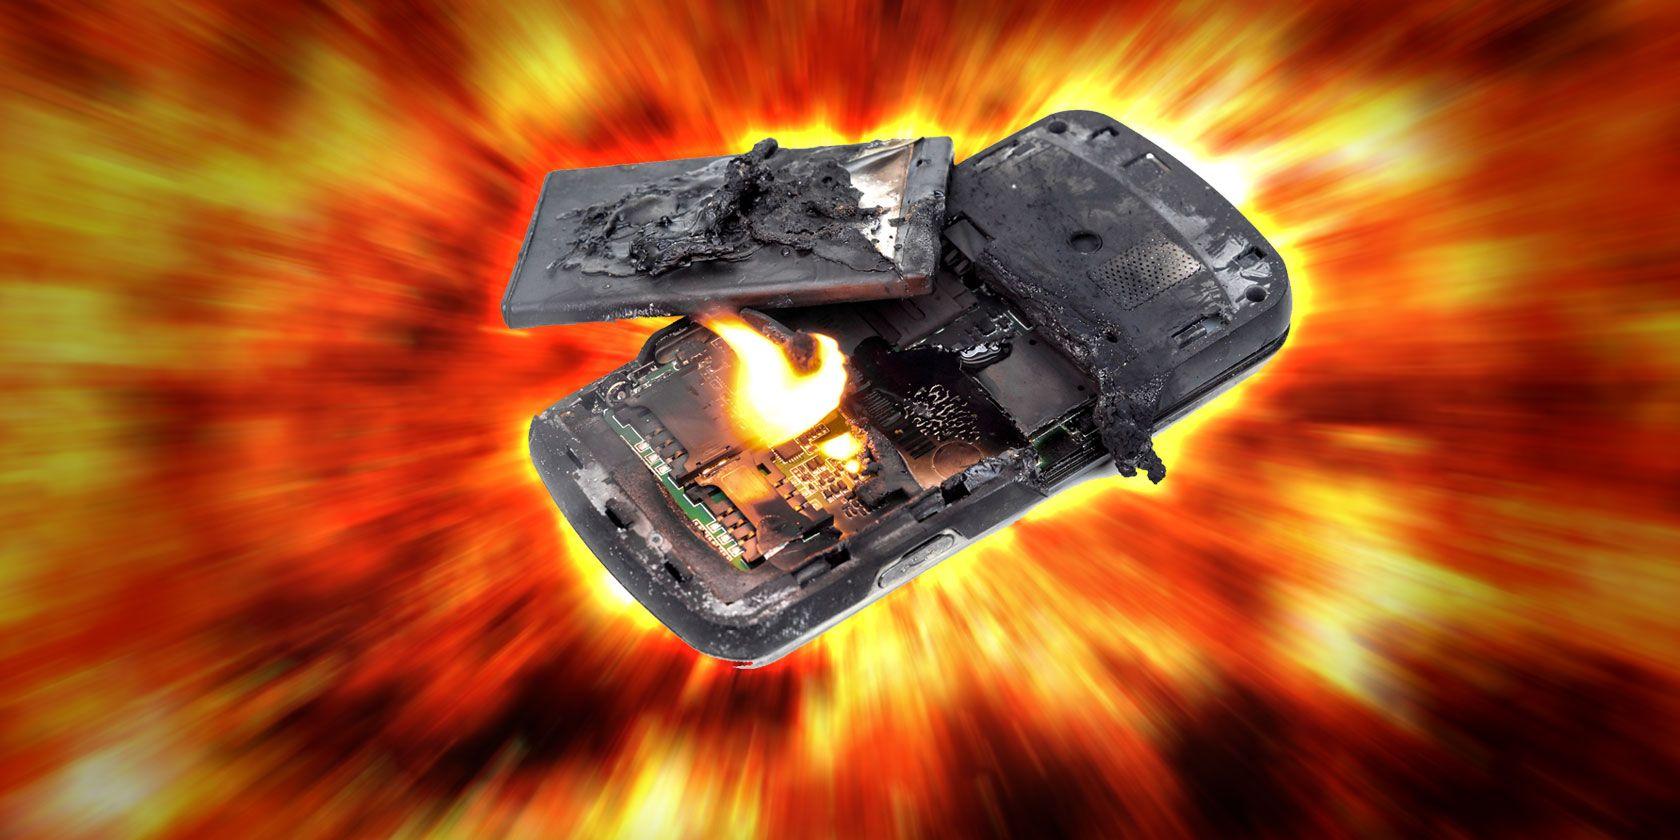 smartphones-explode-prevent